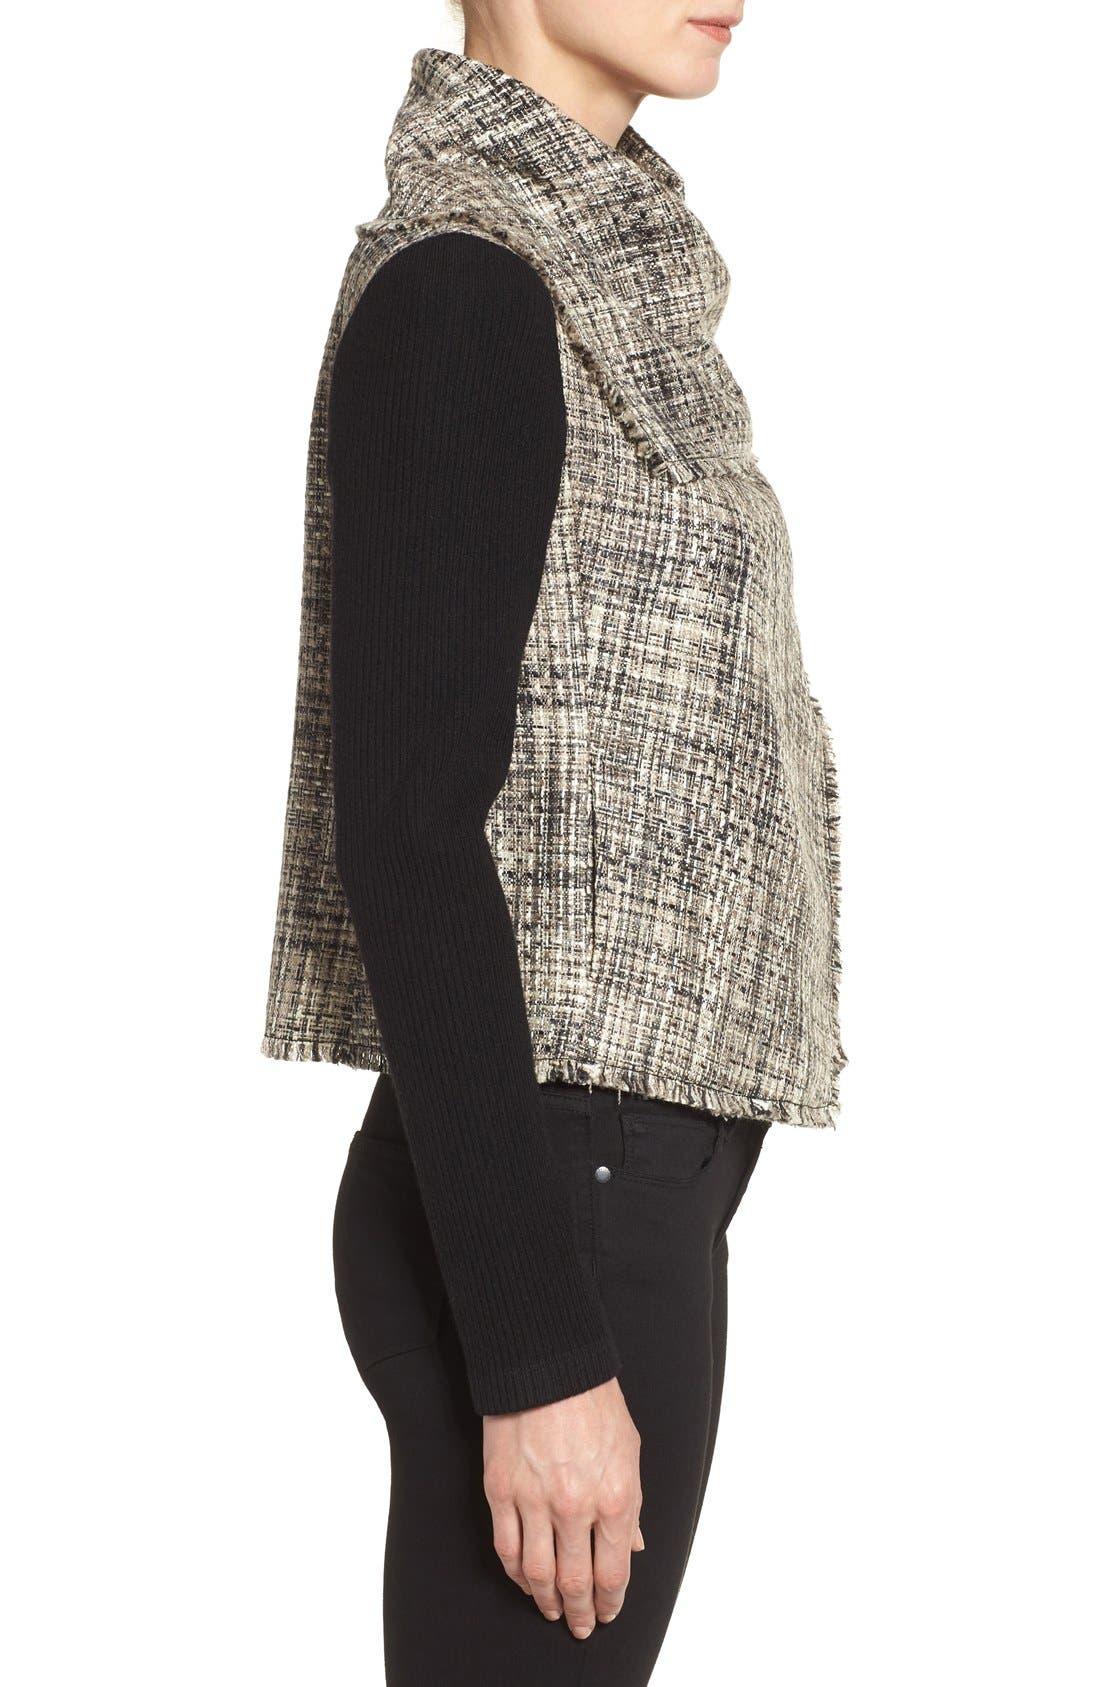 ANNE KLEIN,                             Mixed Media Drape Front Jacket,                             Alternate thumbnail 3, color,                             001